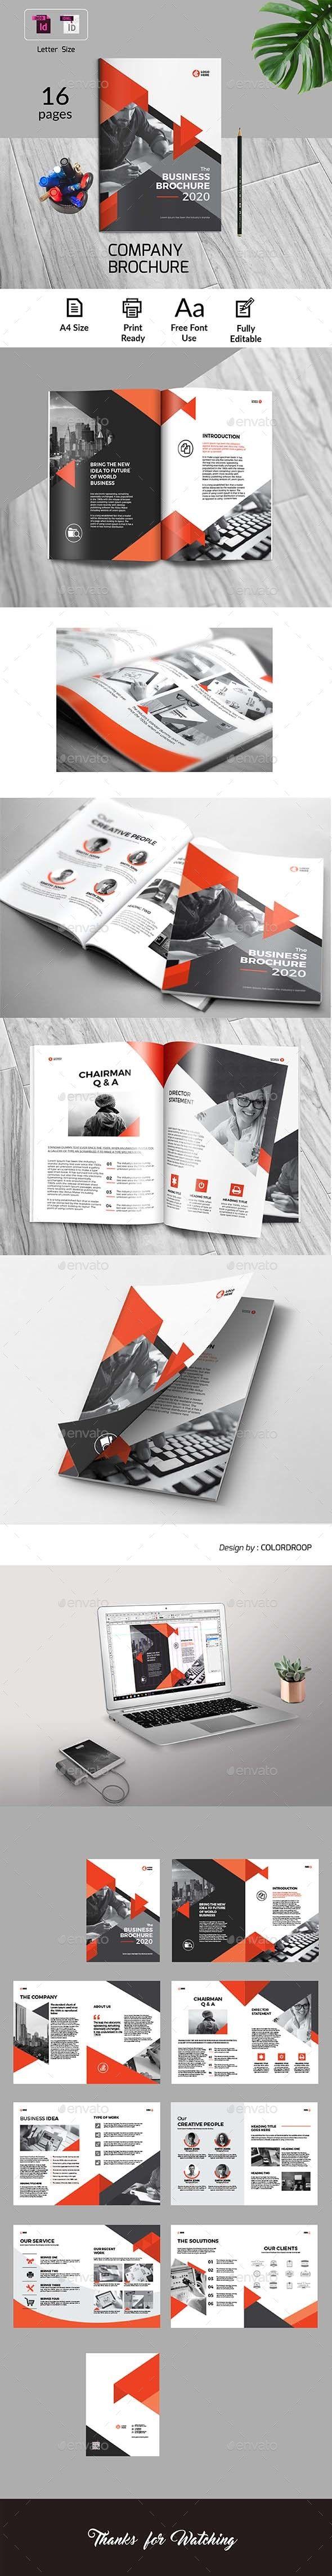 Company Brochure — InDesign INDD #elegant #catalog • Download ➝ https://graphicriver.net/item/company-brochure/21194987?ref=pxcr